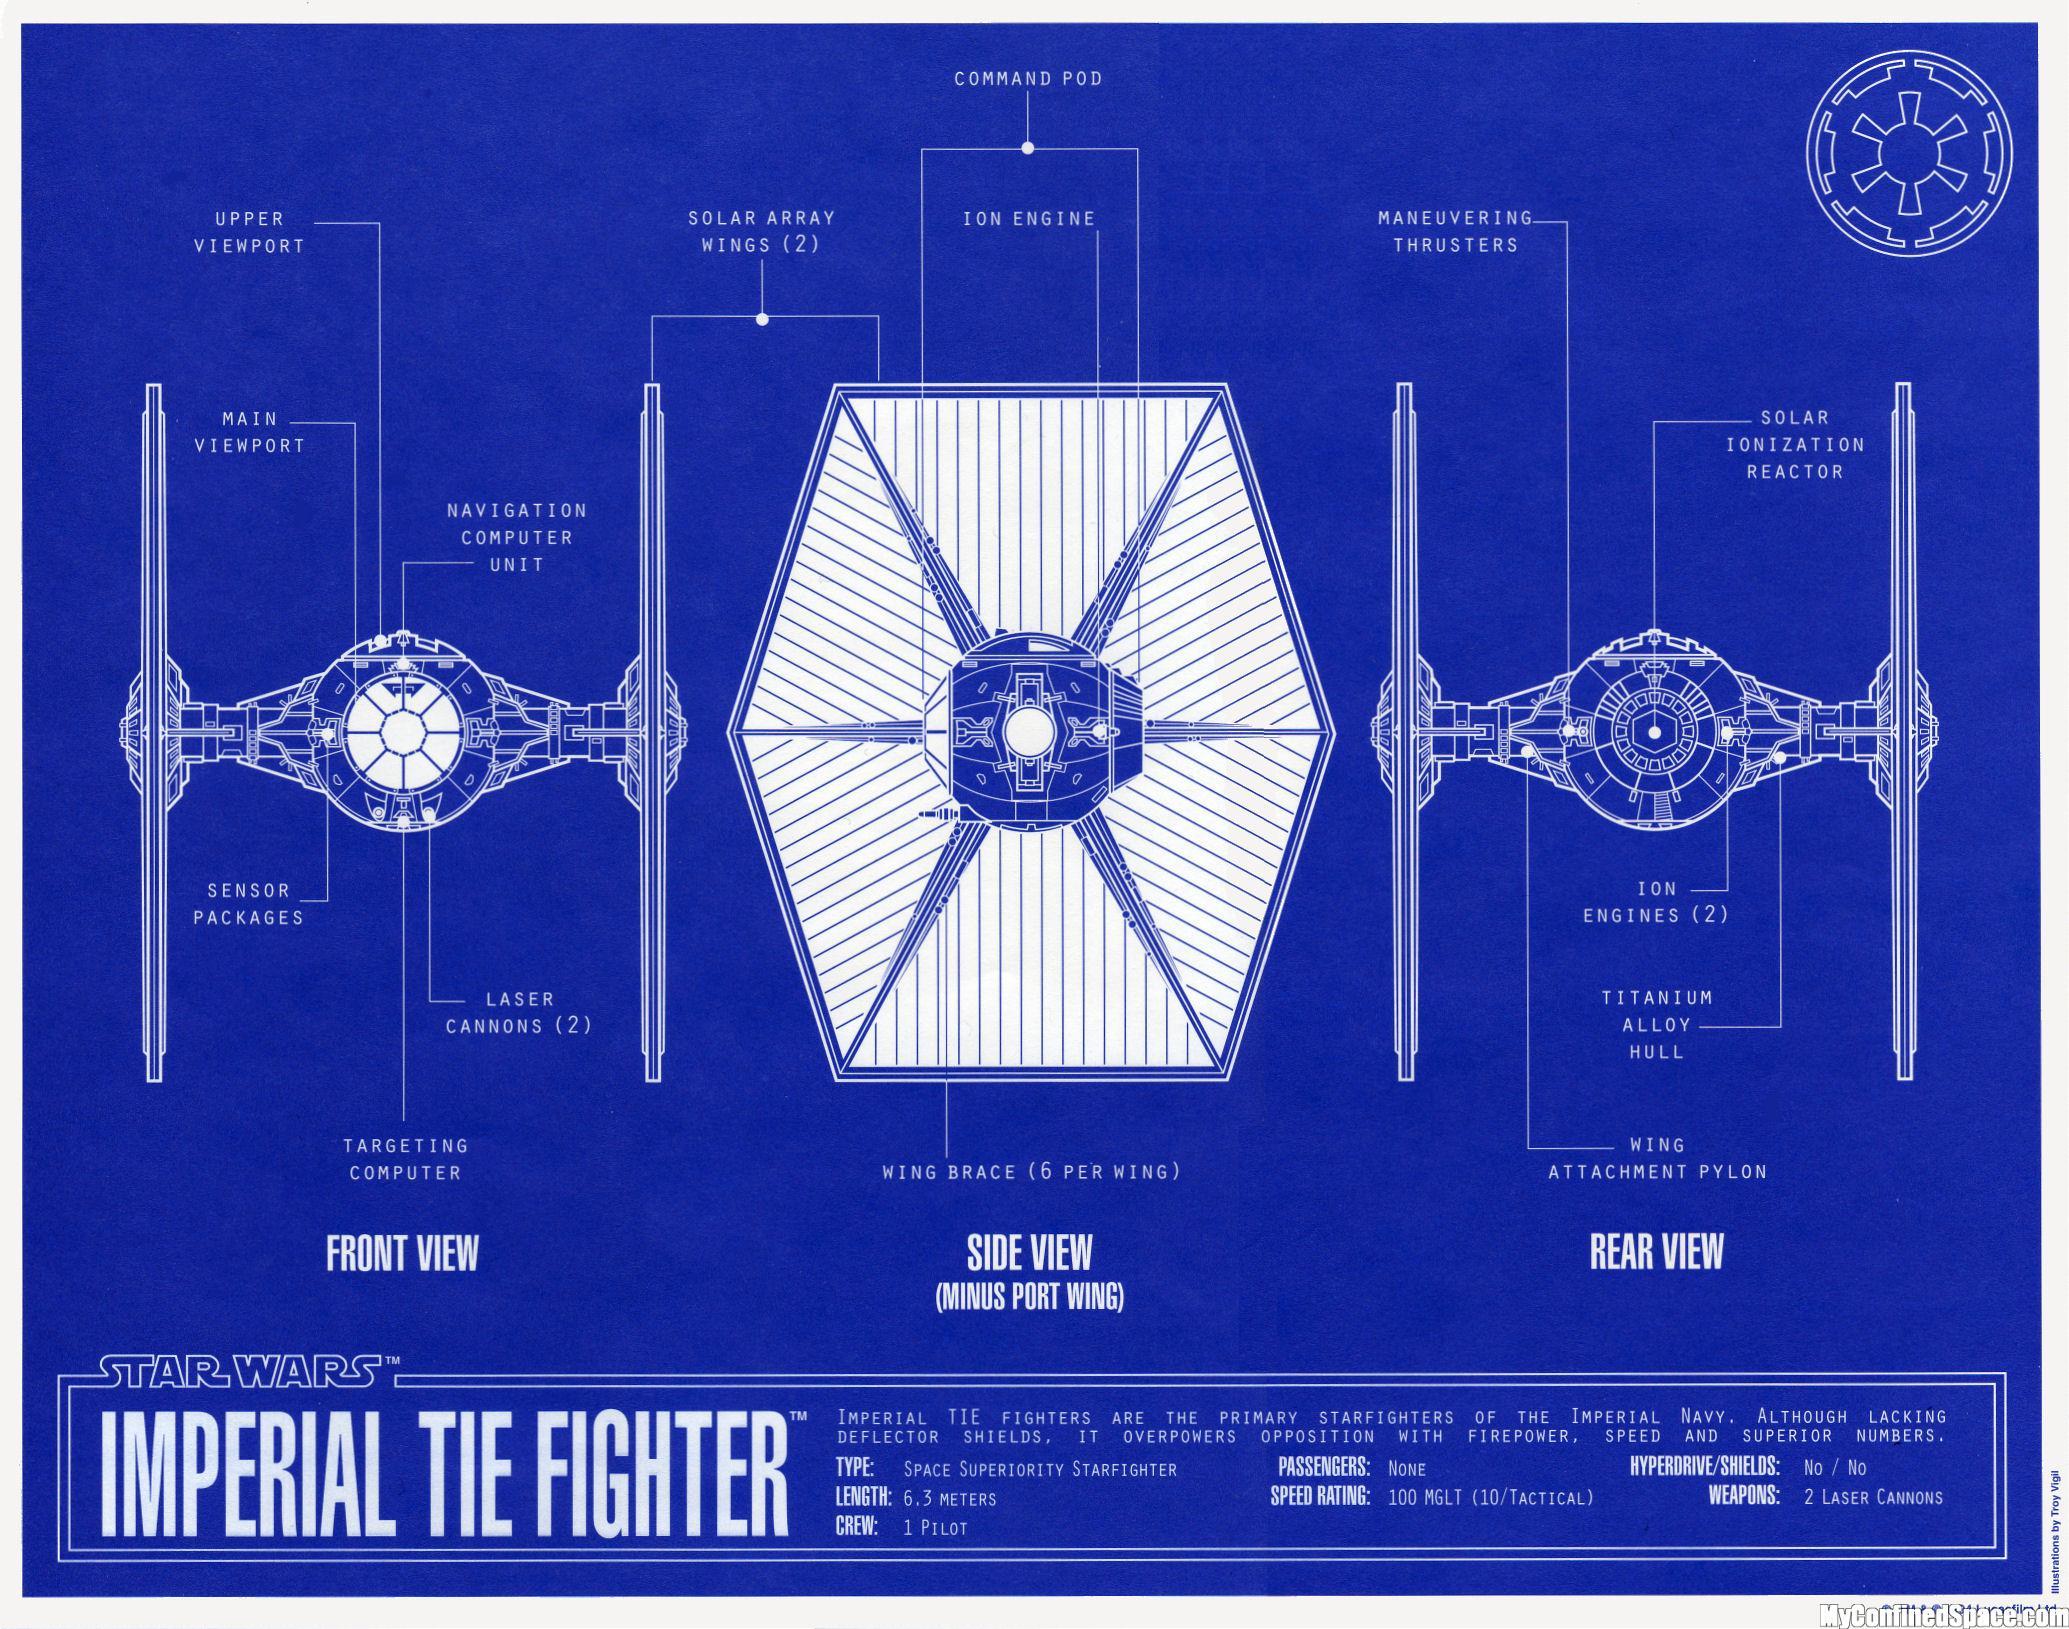 Blueprint wallpaper wallpapersafari blueprints fighter tie hd wallpaper 2069x1629 malvernweather Images